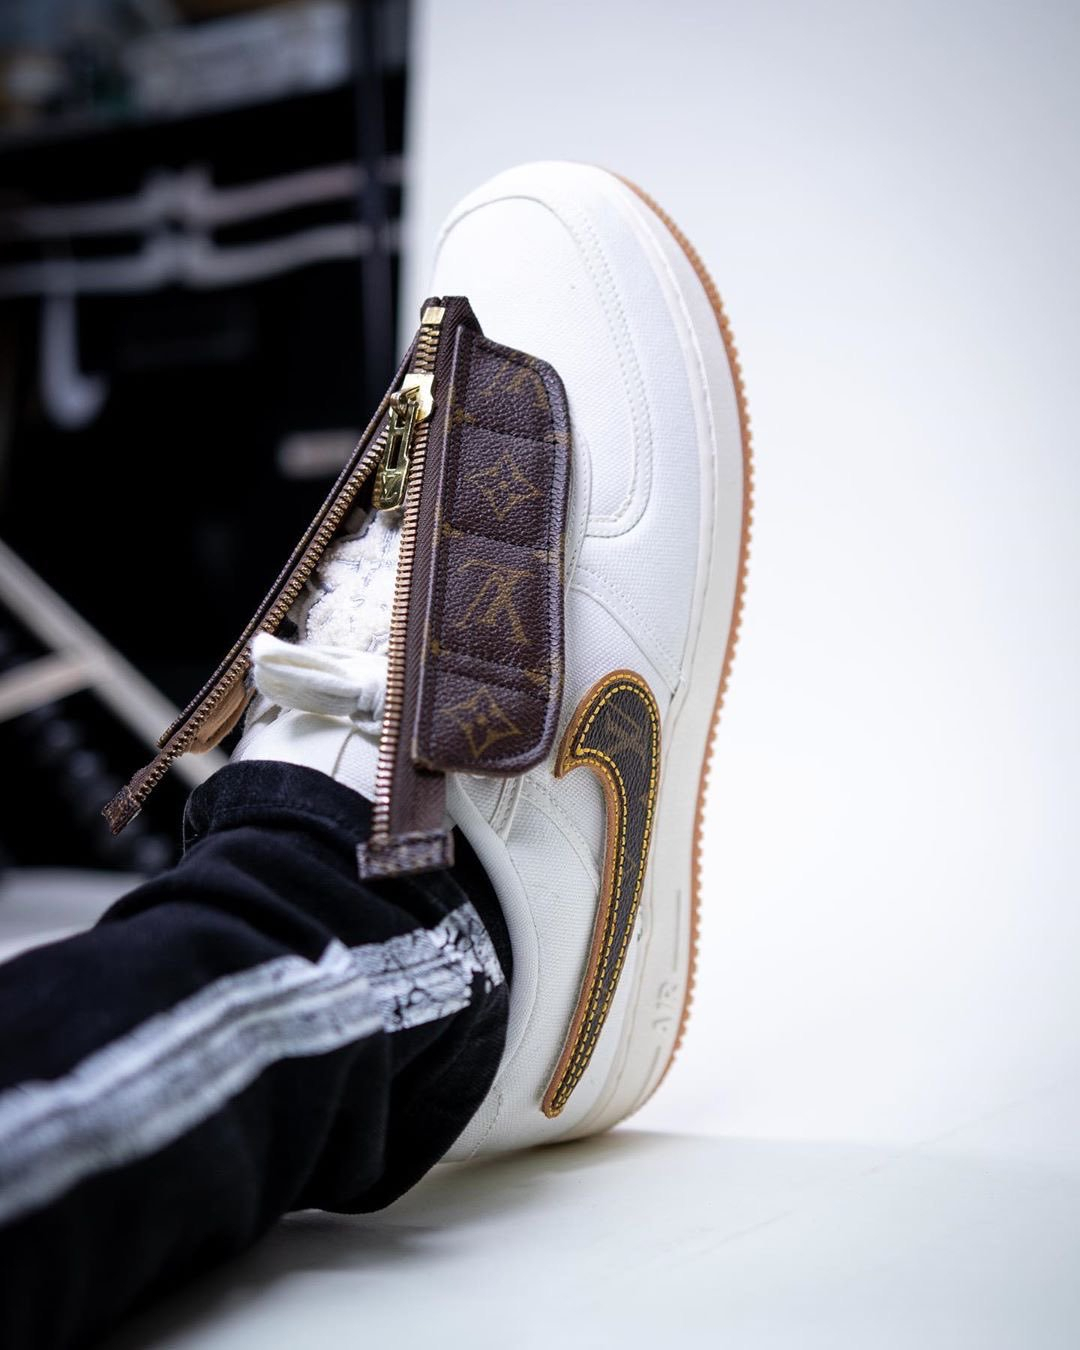 Kicksolio x Louis Vuitton x Nike Air Force 1 ''Travis Scott Inspired''